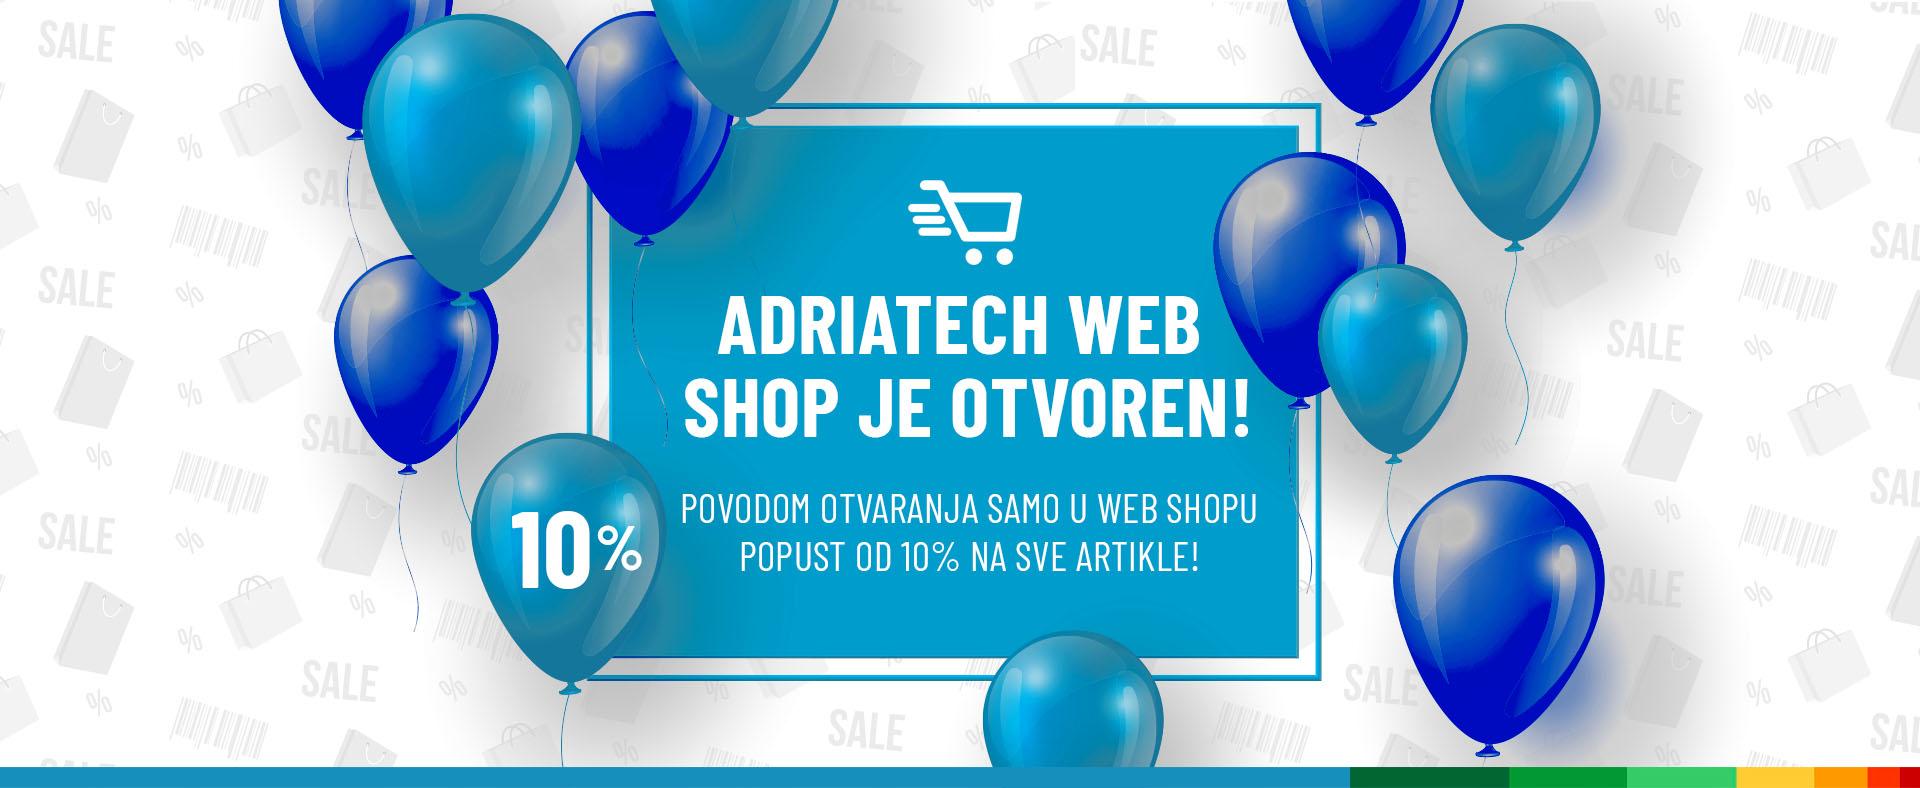 Adriatech Web shop